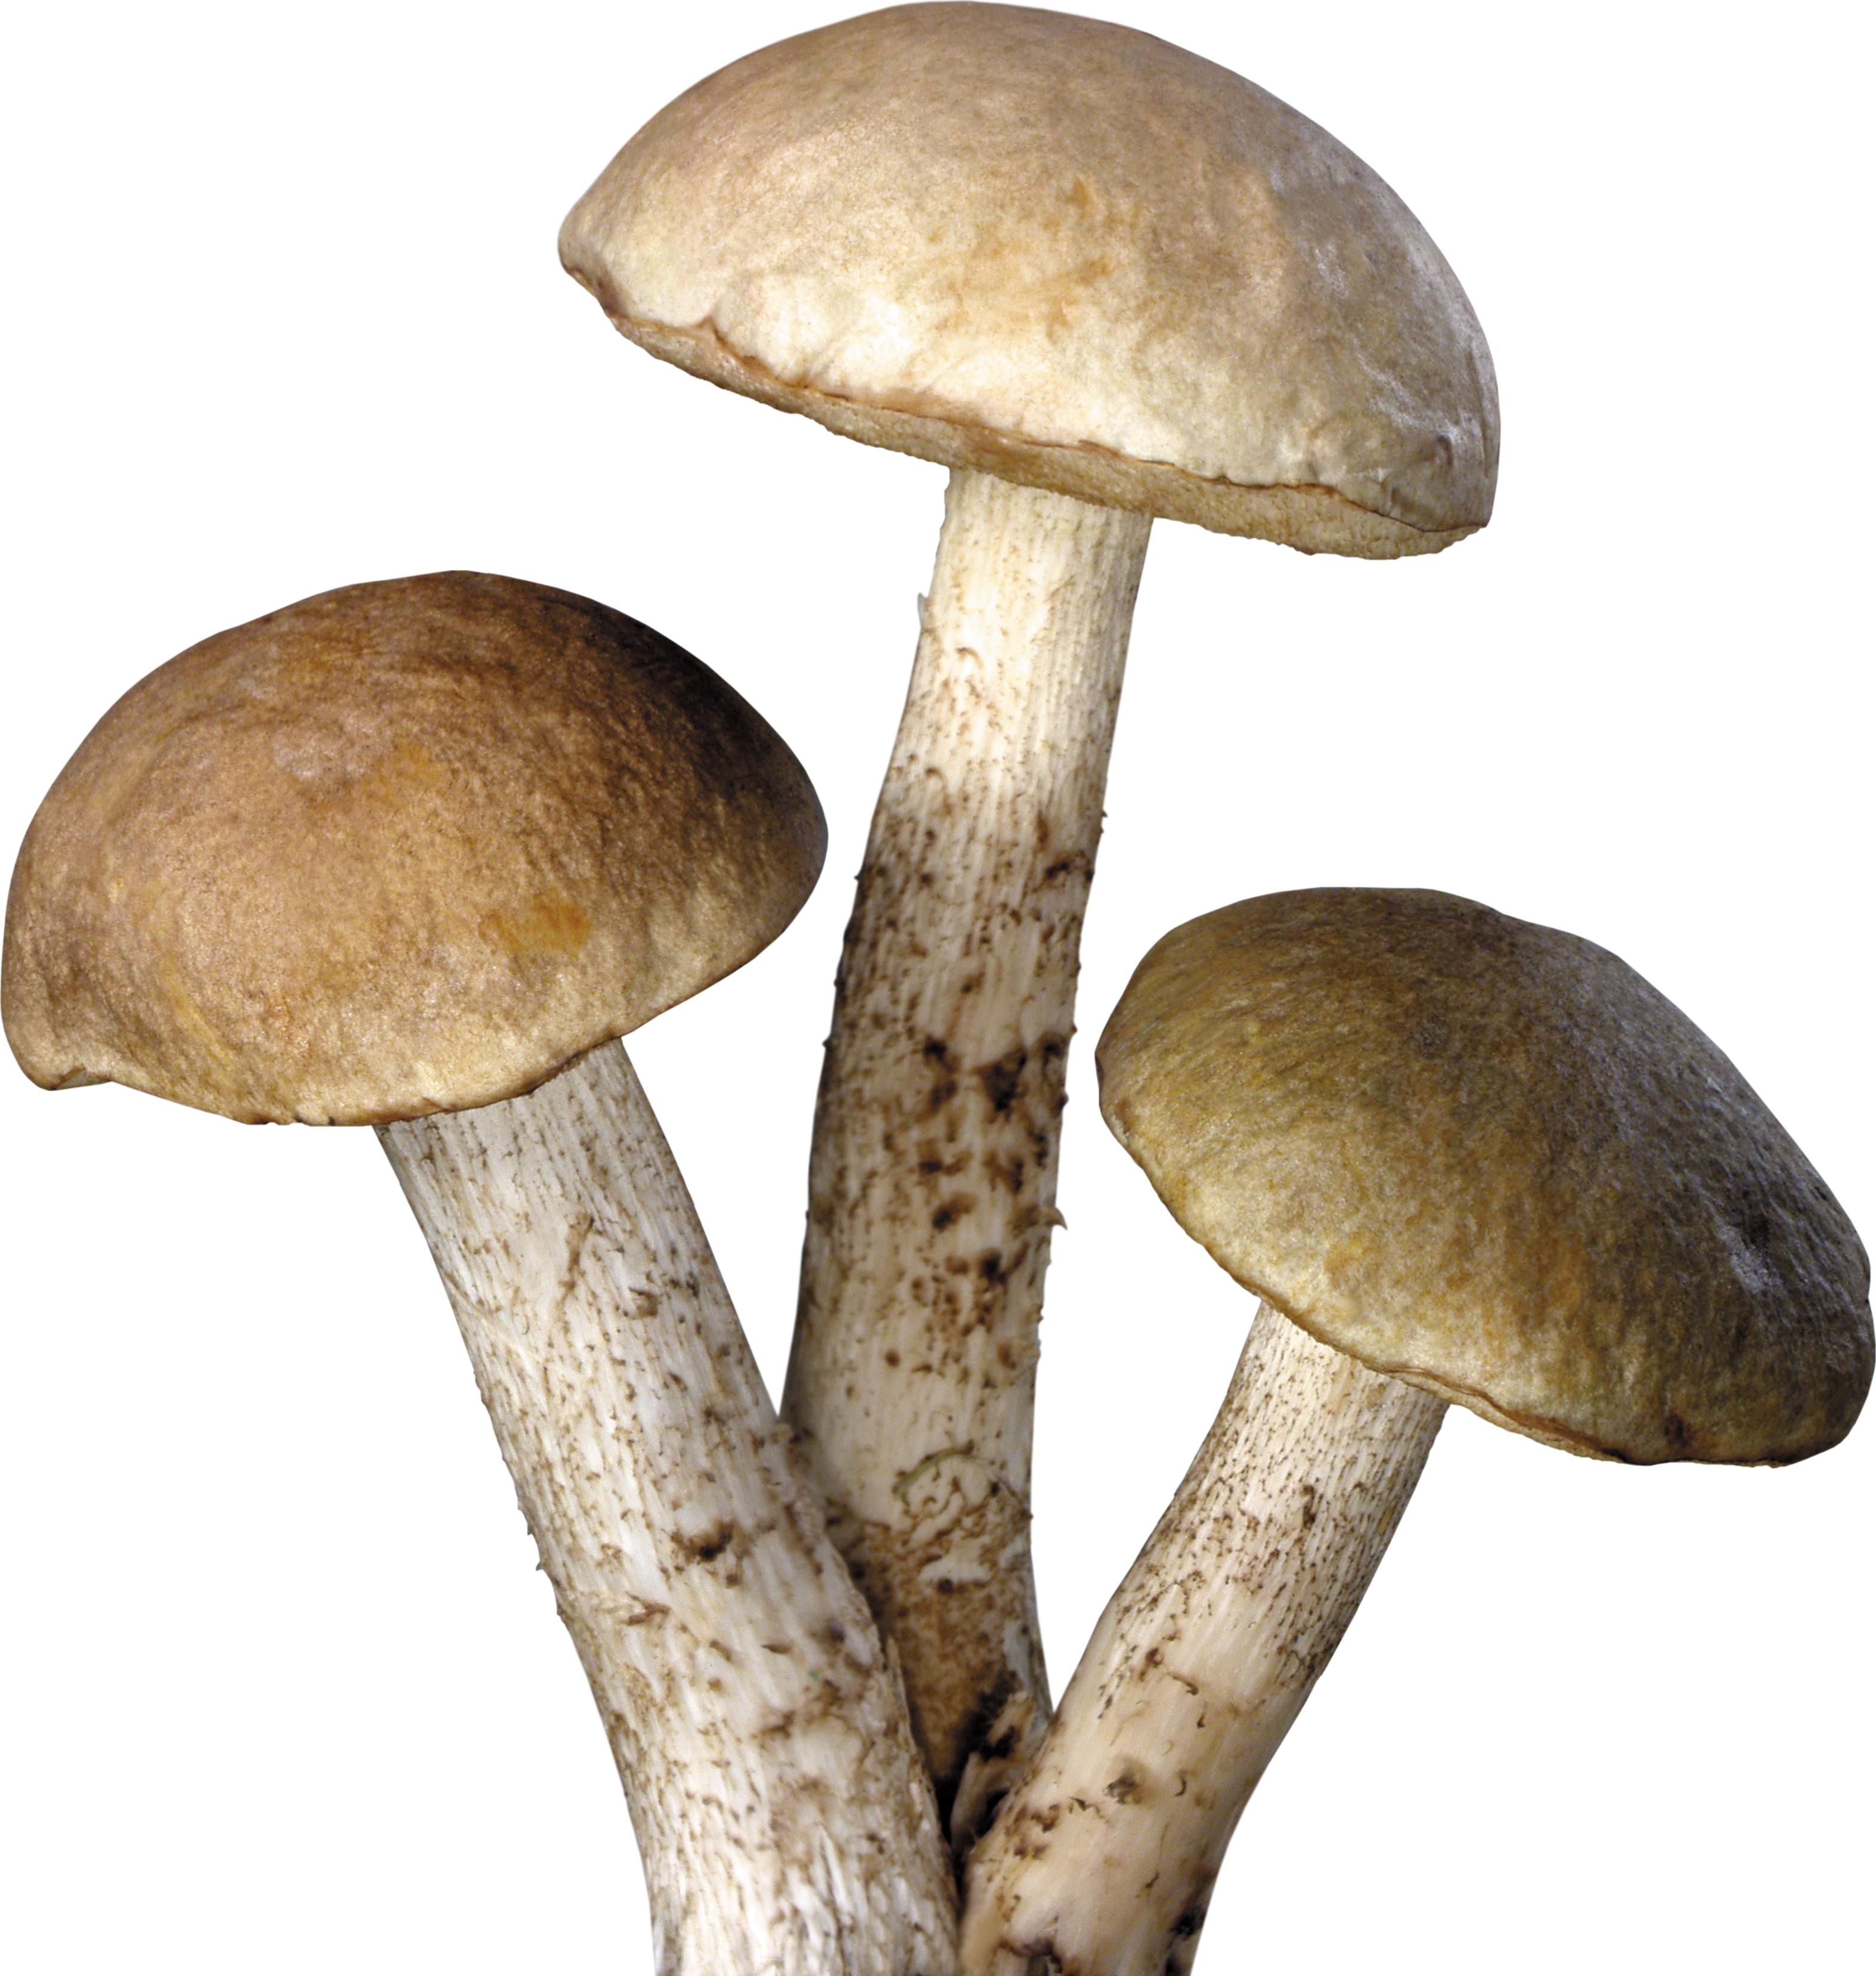 High Resolution Wallpaper | Mushroom 3147x3314 px